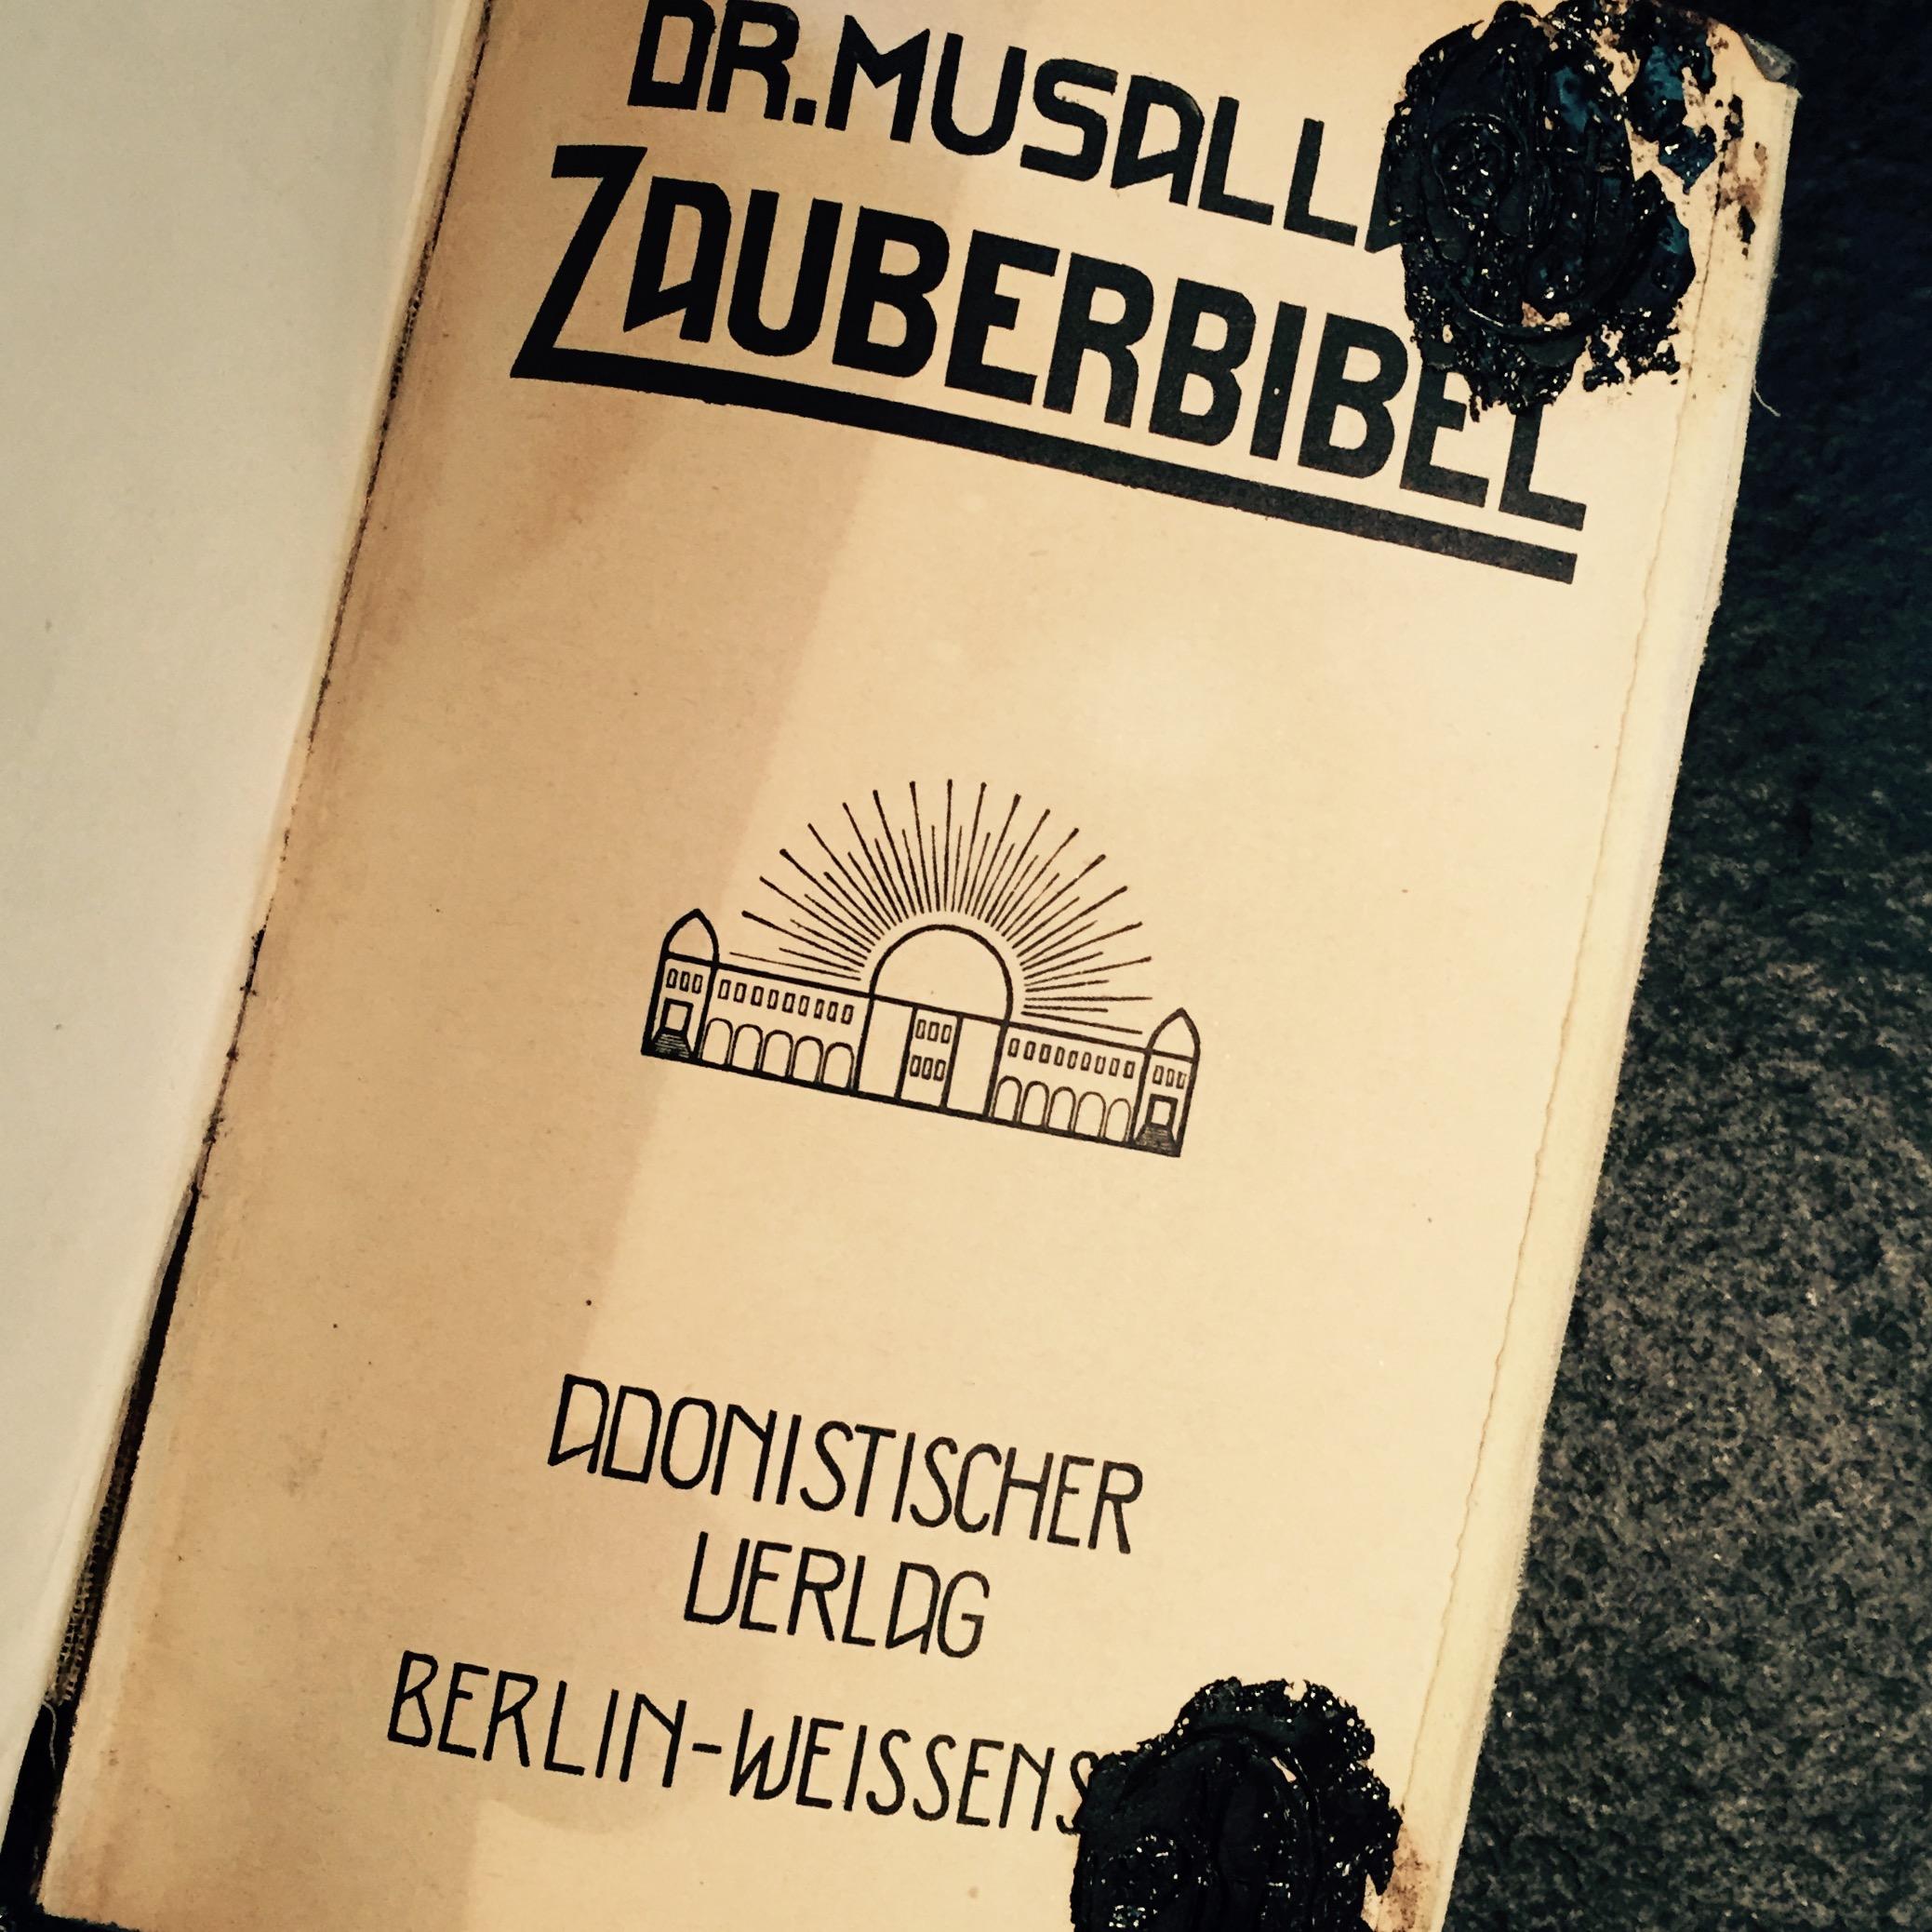 Dr.Musallam, Zauberbibel